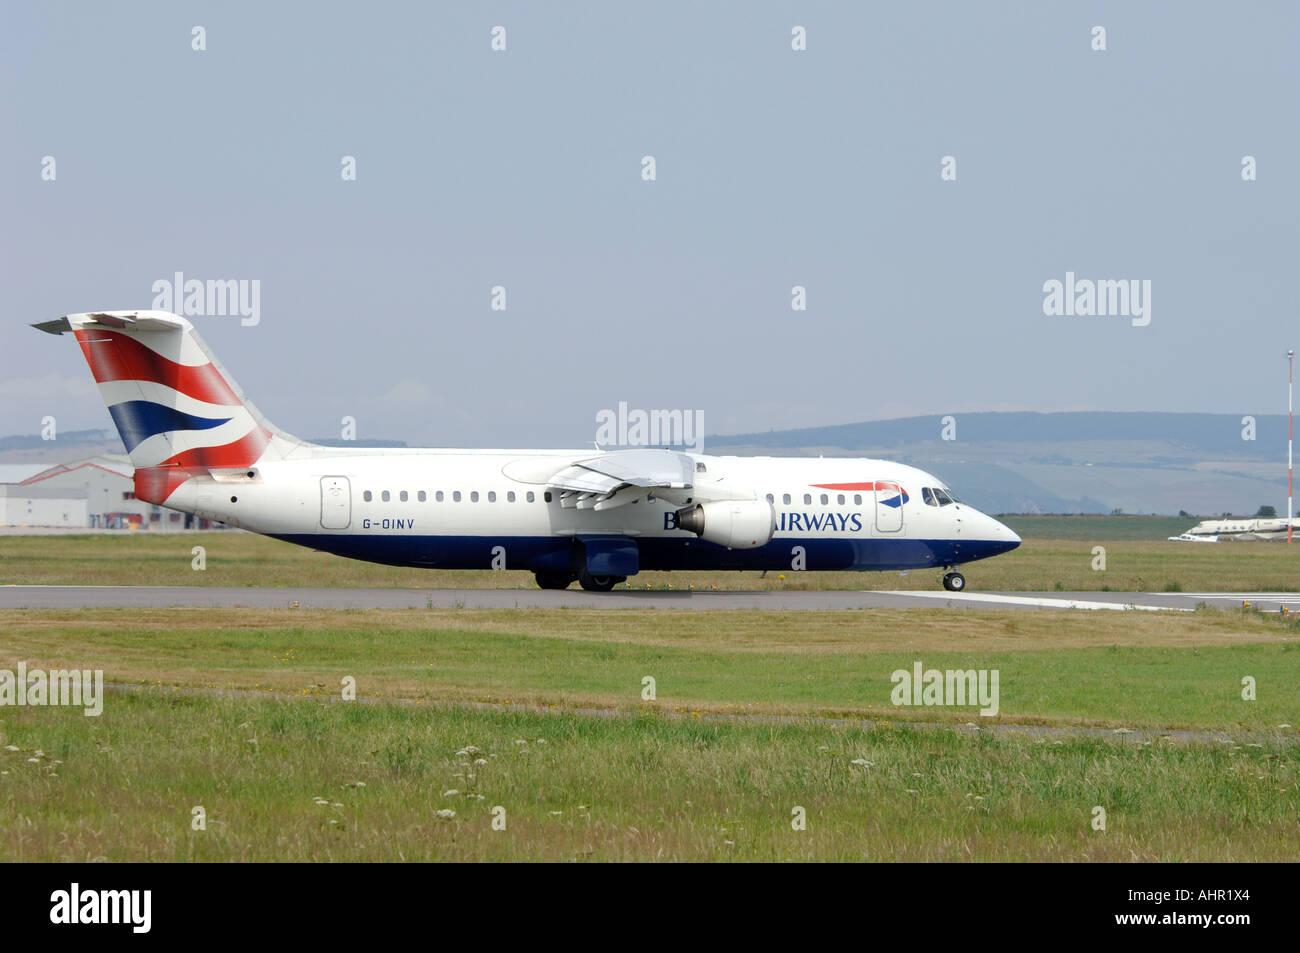 BEA 146-300 British Airways Connect Passenger Jet Airliner.  XAV 1282-303 - Stock Image